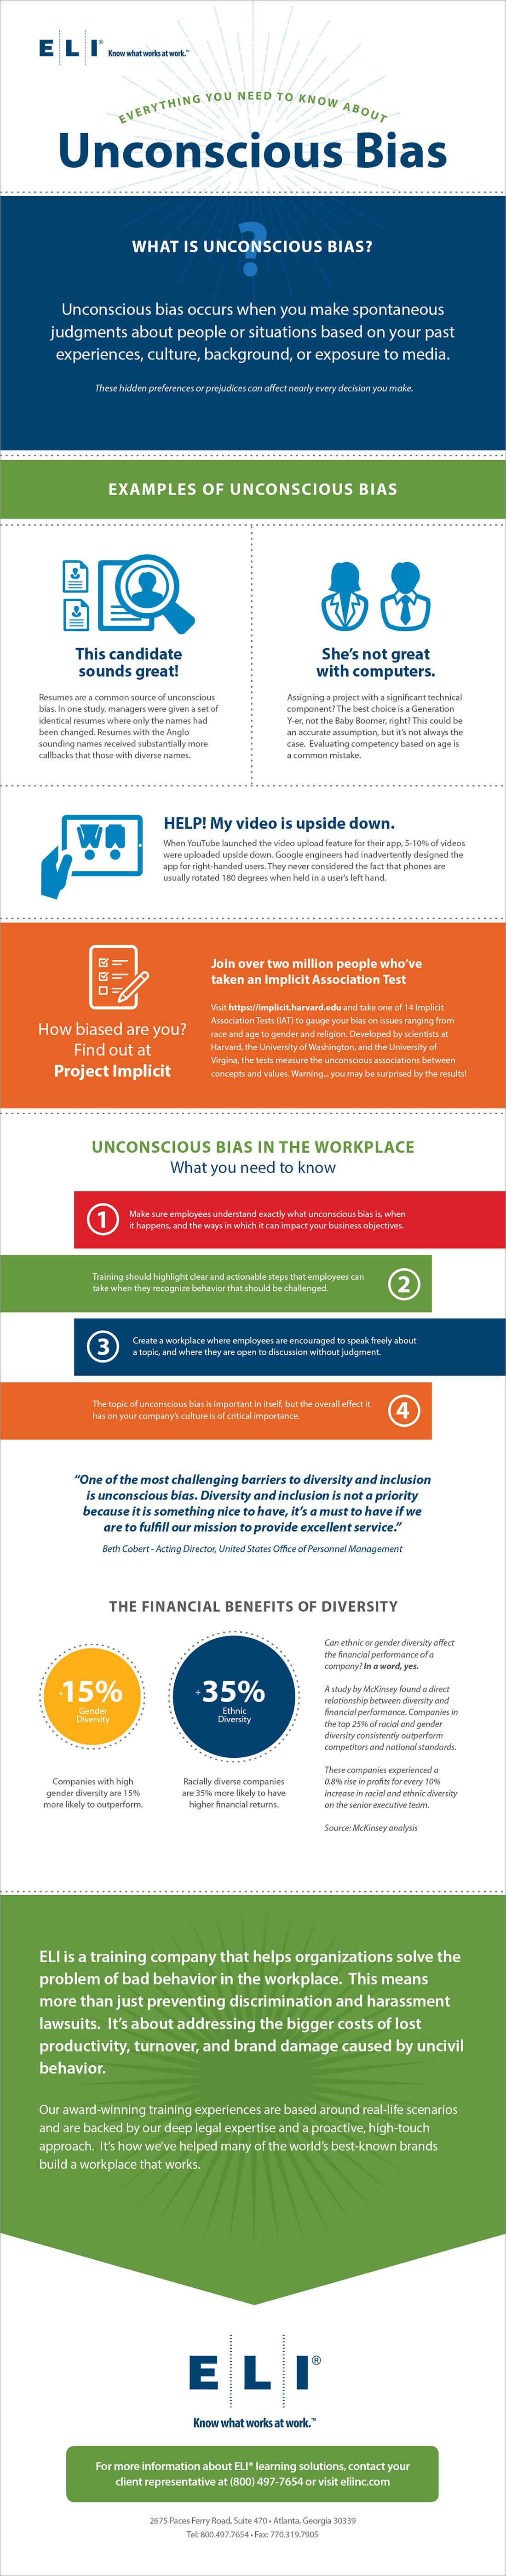 unconscious-bias-infographic-eli